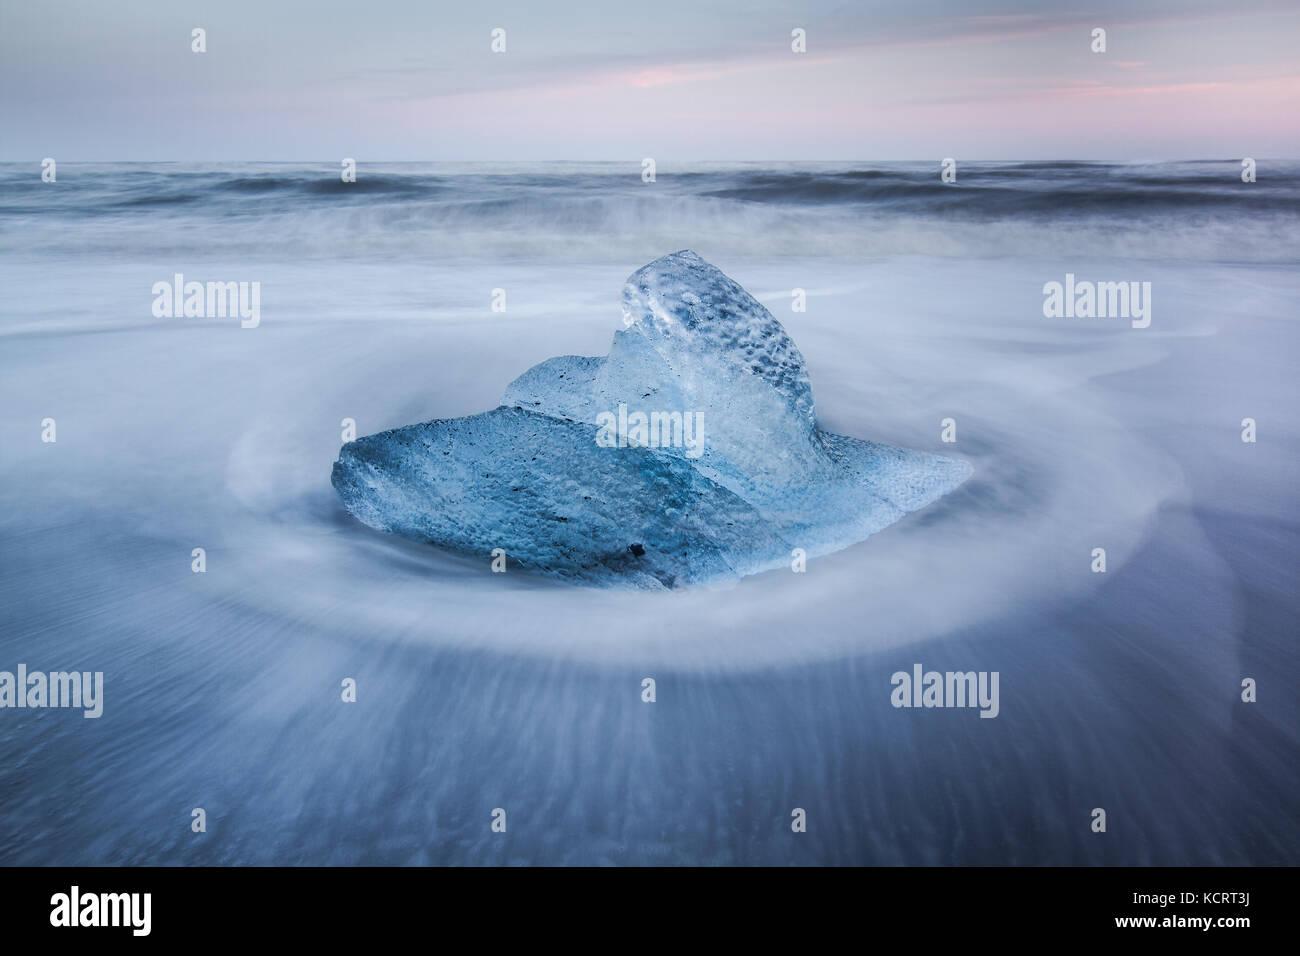 Glacial Icebergs washed up on to the black sands of breidamurkursandur near Vatnajokull national Park, Iceland Stock Photo